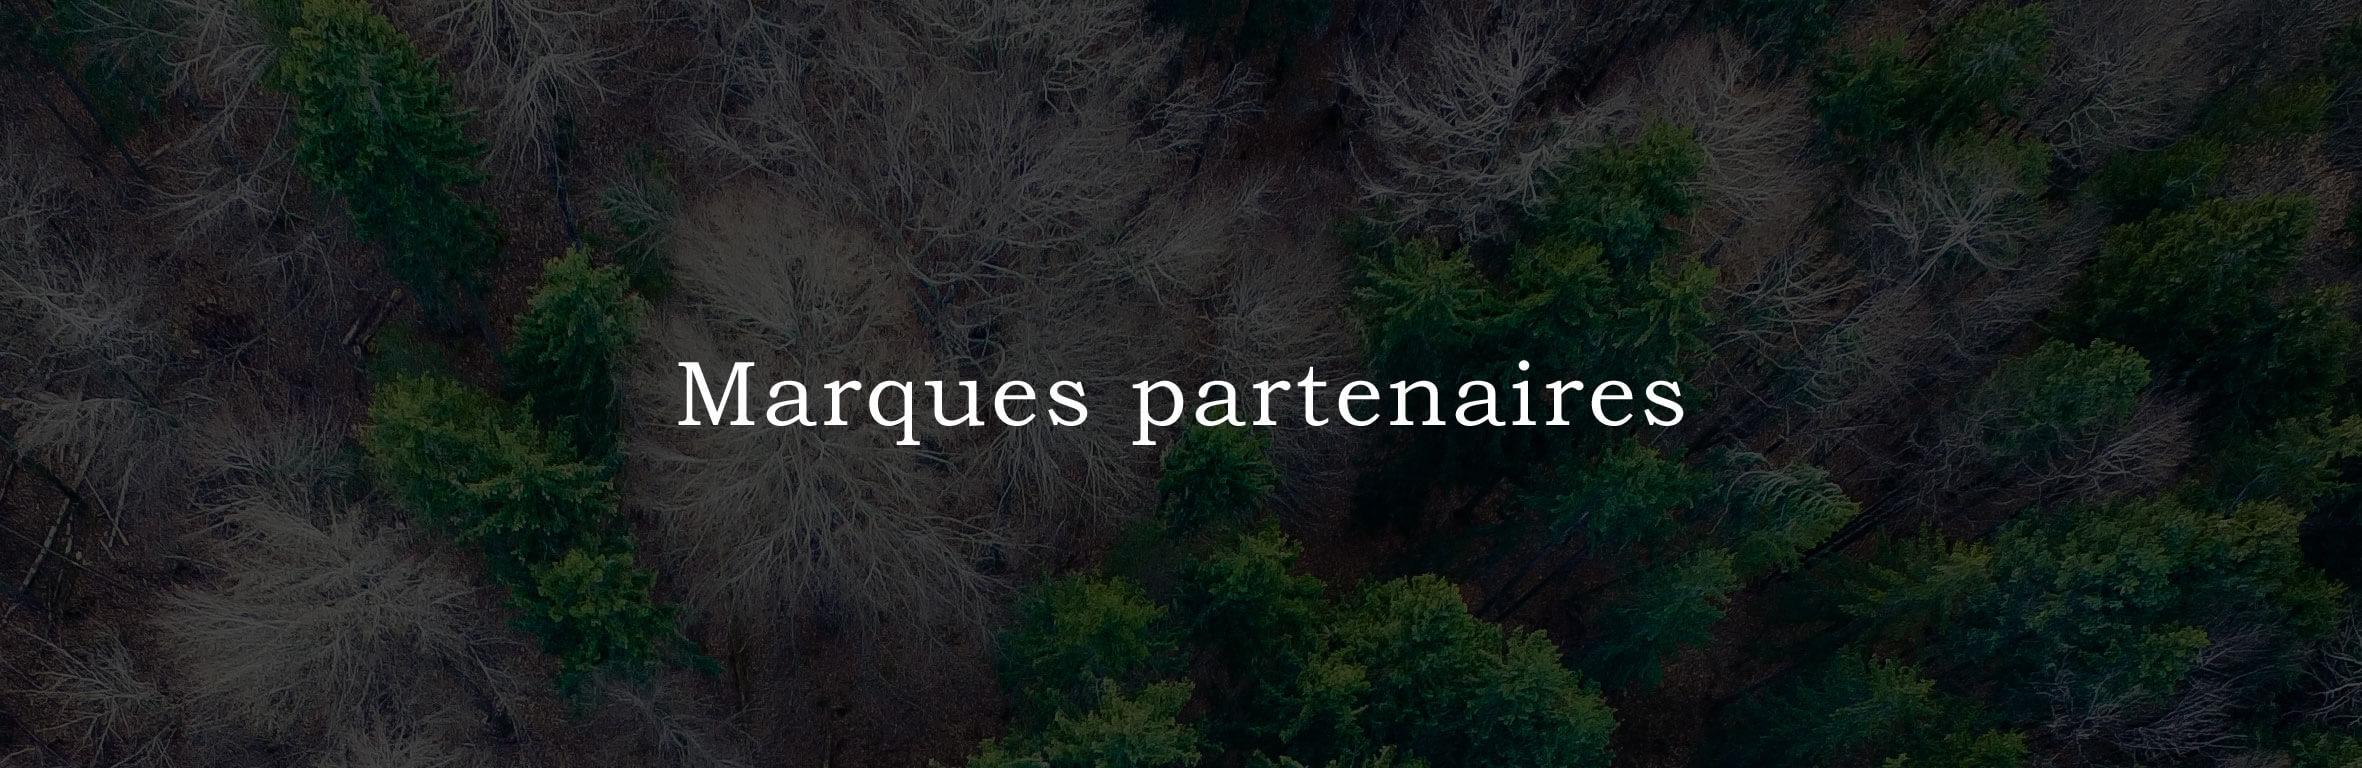 Marques partenaires